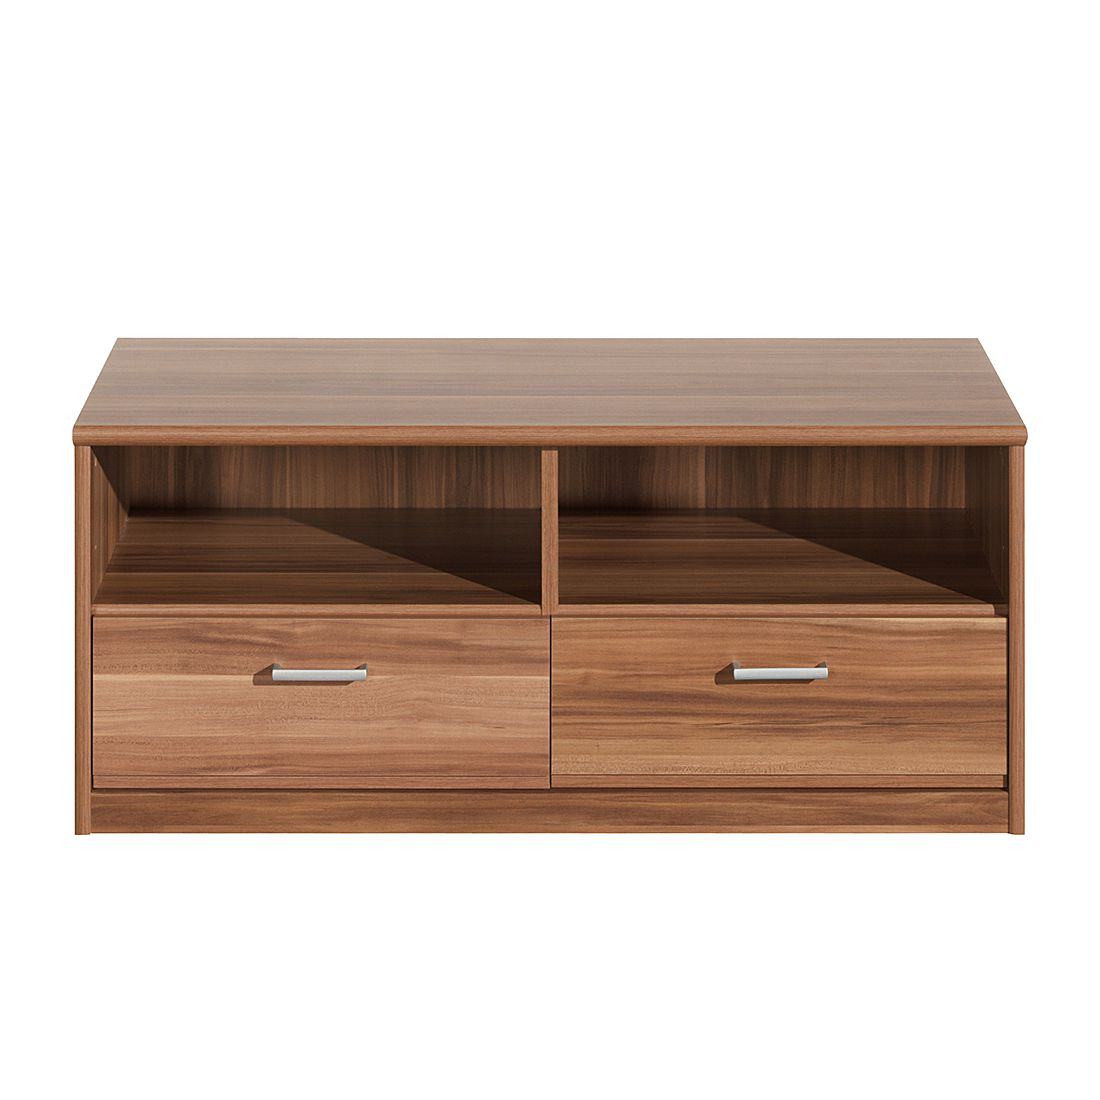 m bel lowboard nussbaum preis vergleich 2016. Black Bedroom Furniture Sets. Home Design Ideas